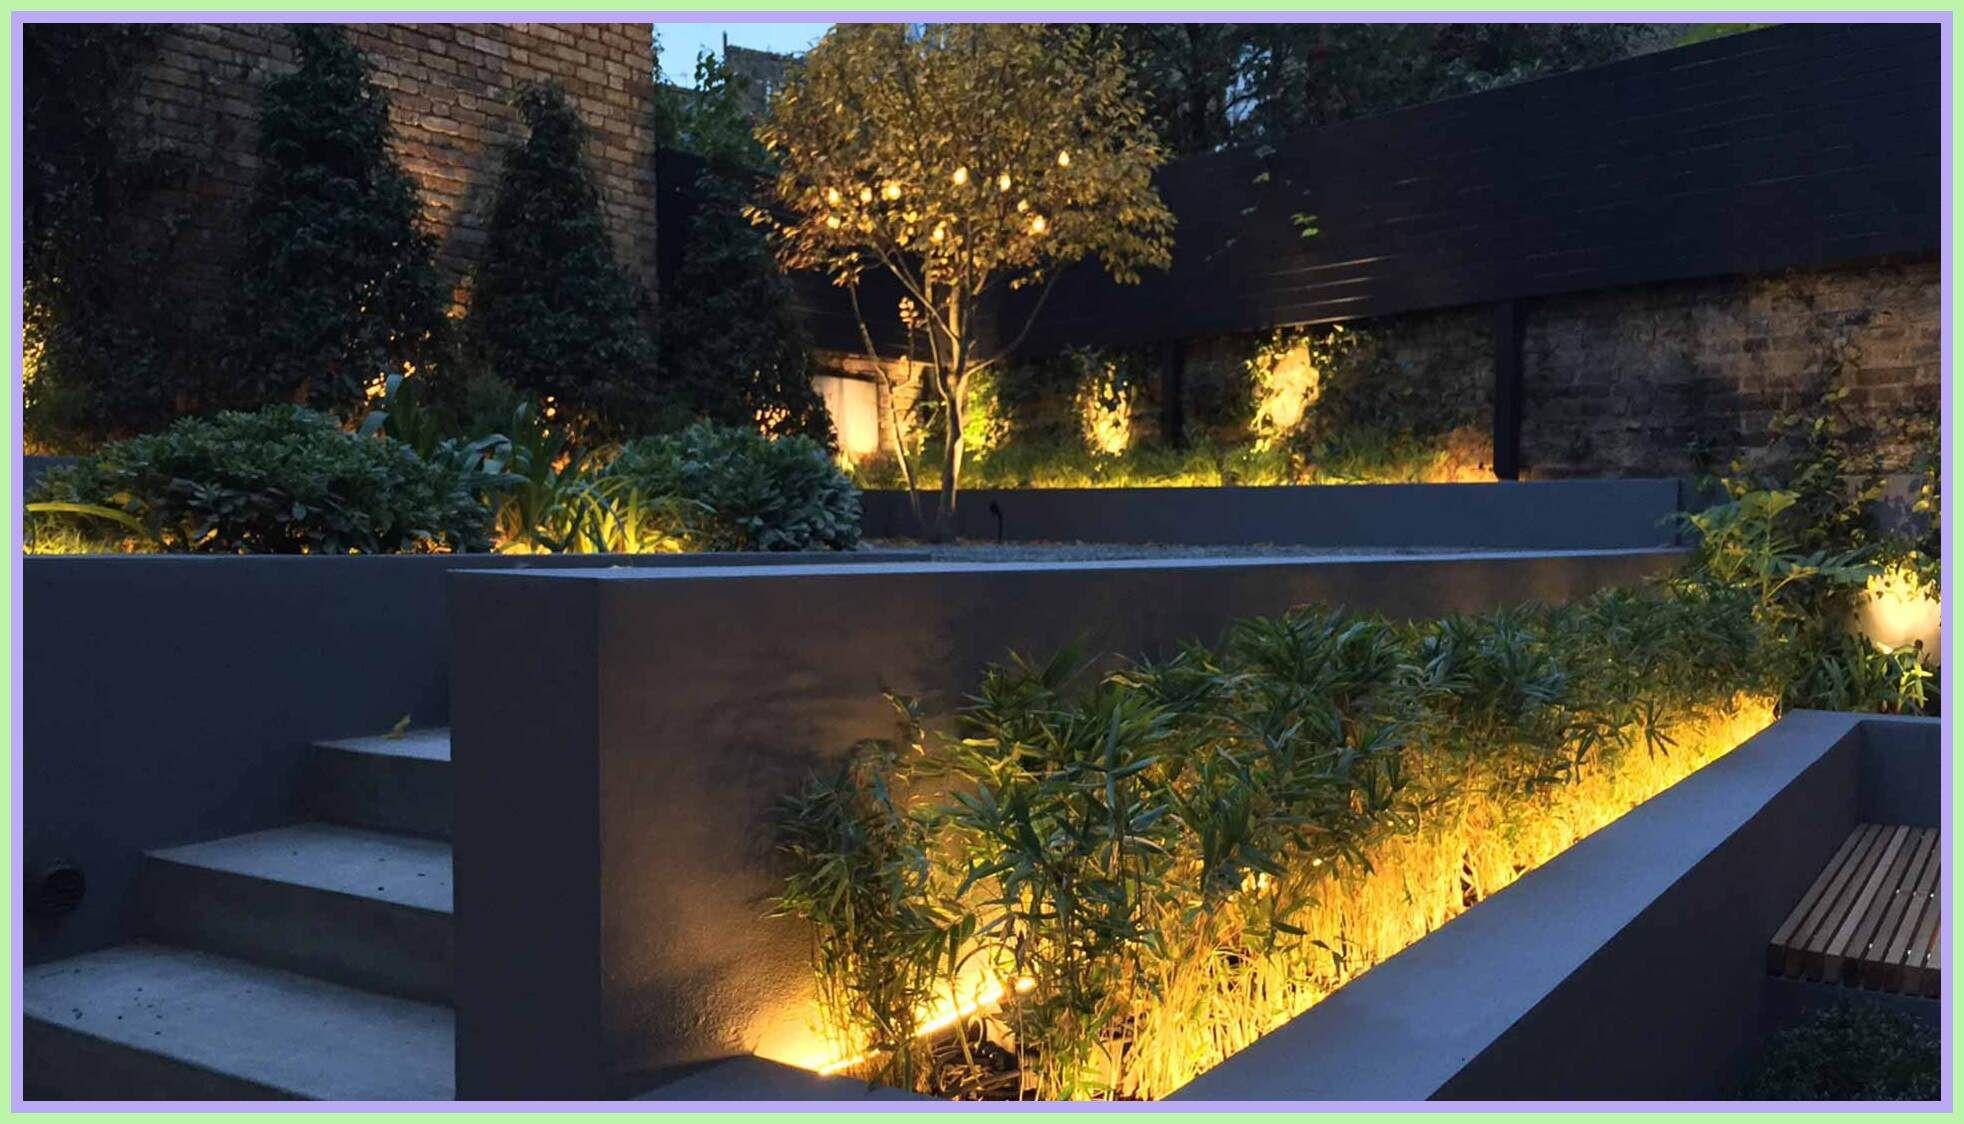 36 Reference Of Landscape Lighting Layout Design In 2020 Garden Lighting Design Landscape Lighting Patio Lighting Ideas Uk